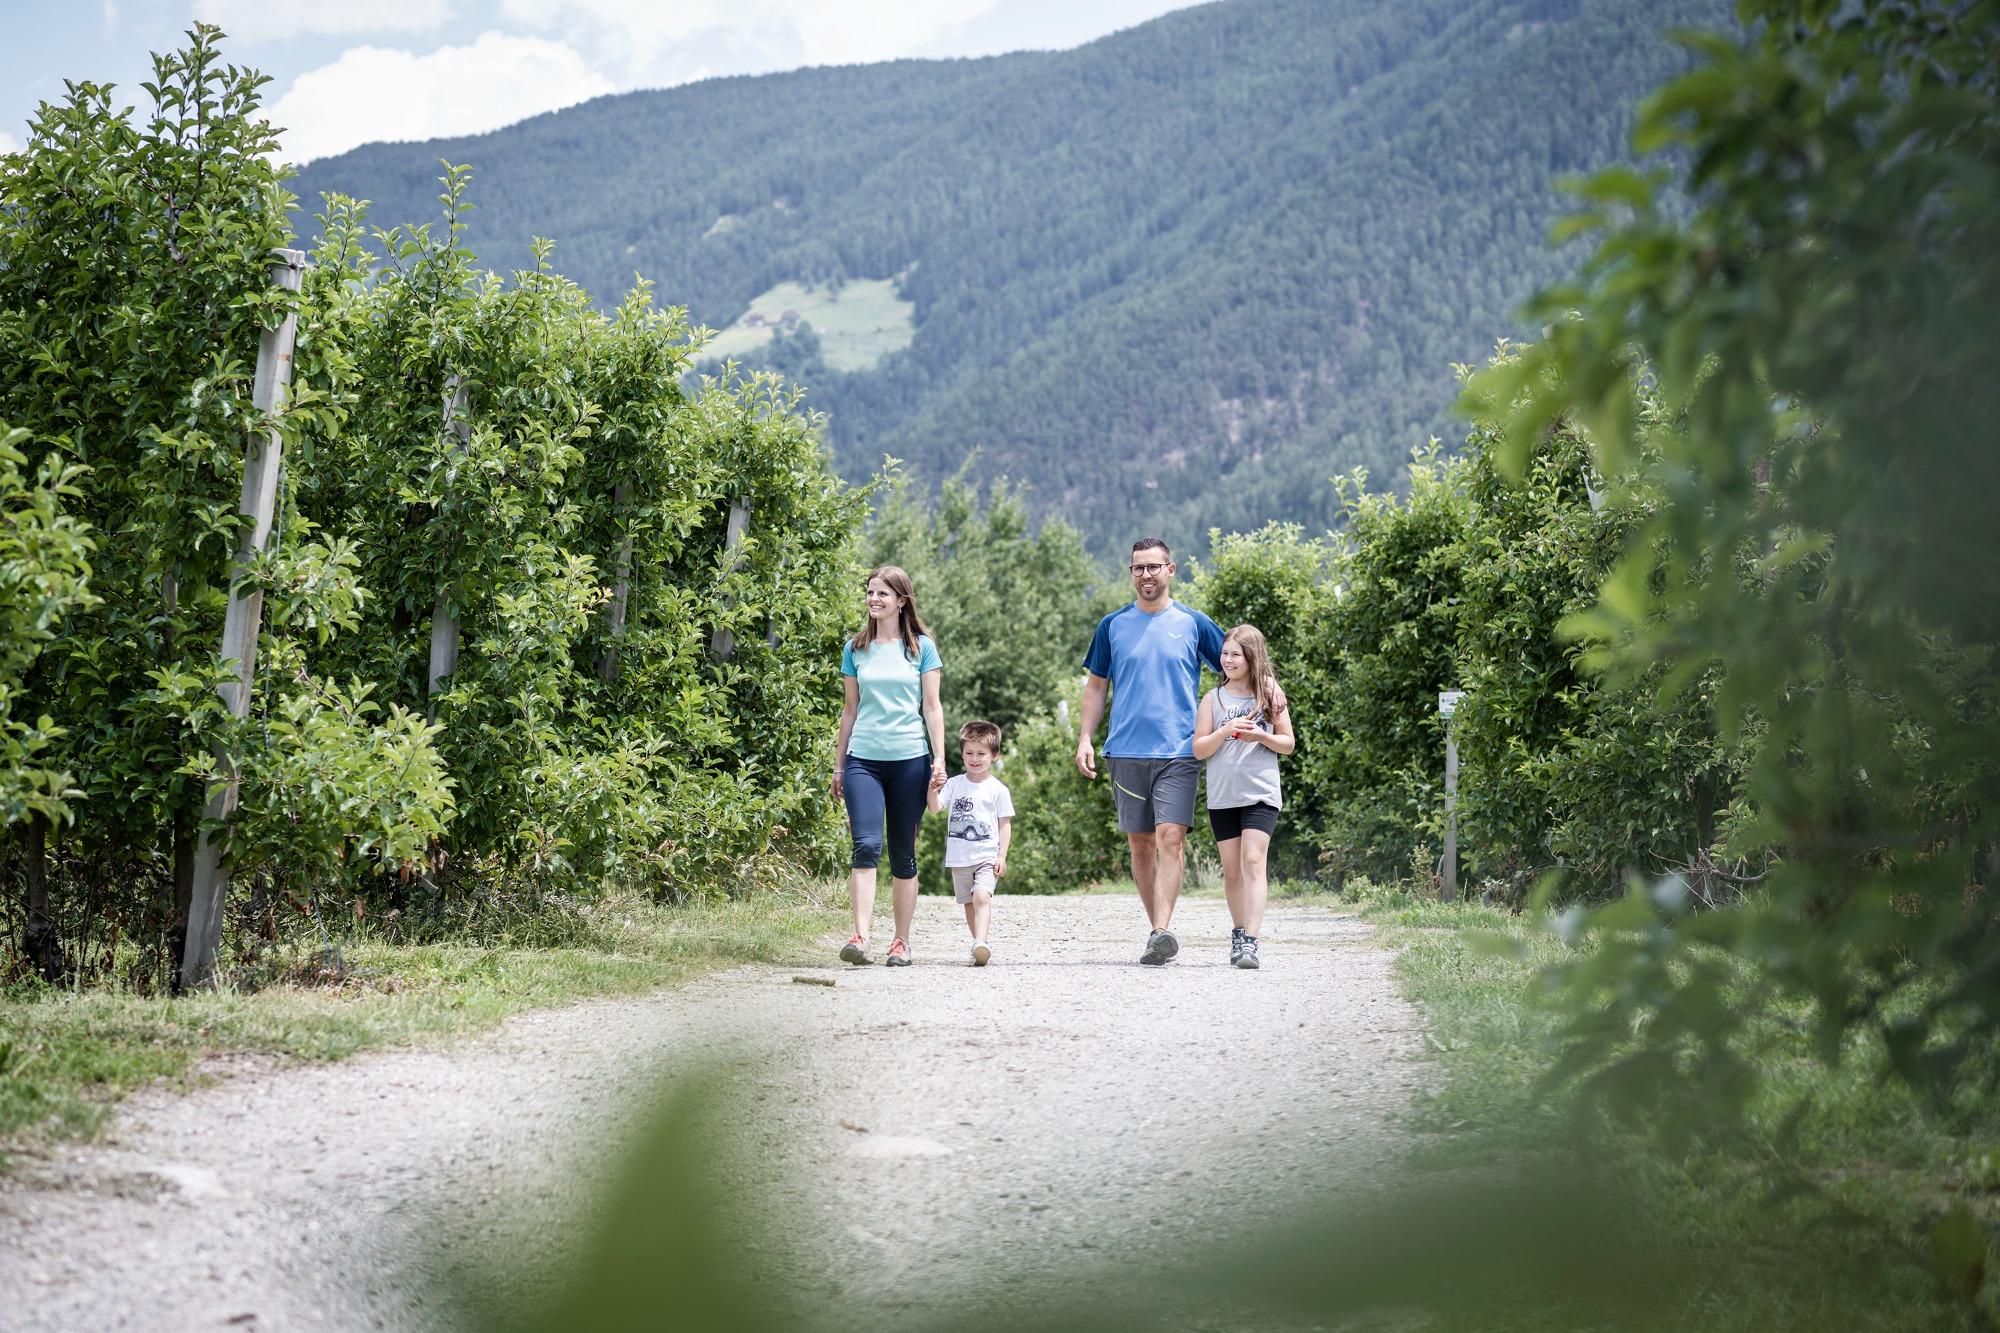 Akupressur: Foto vom Wellnesshotel Das Mühlwald - Quality Time Family Resort   Wellness Südtirol